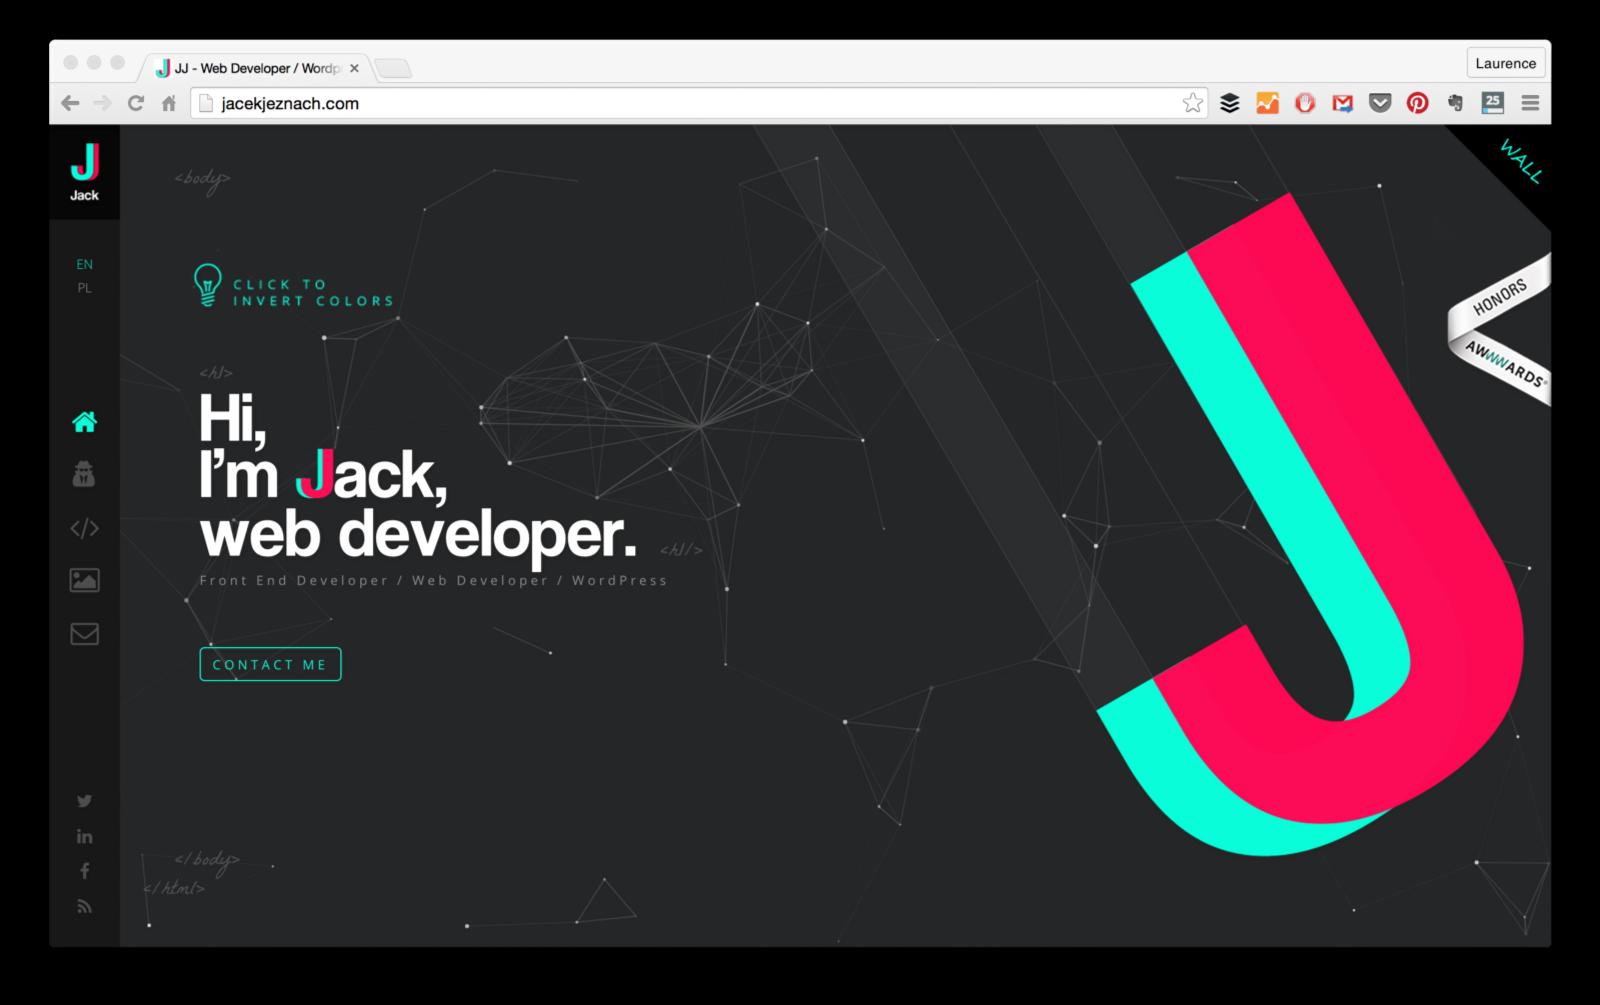 15 Web Developer Portfolios To Inspire You One Of The Toughest Things To Do As A New Deve Web Developer Portfolio Portfolio Website Design Portfolio Web Design